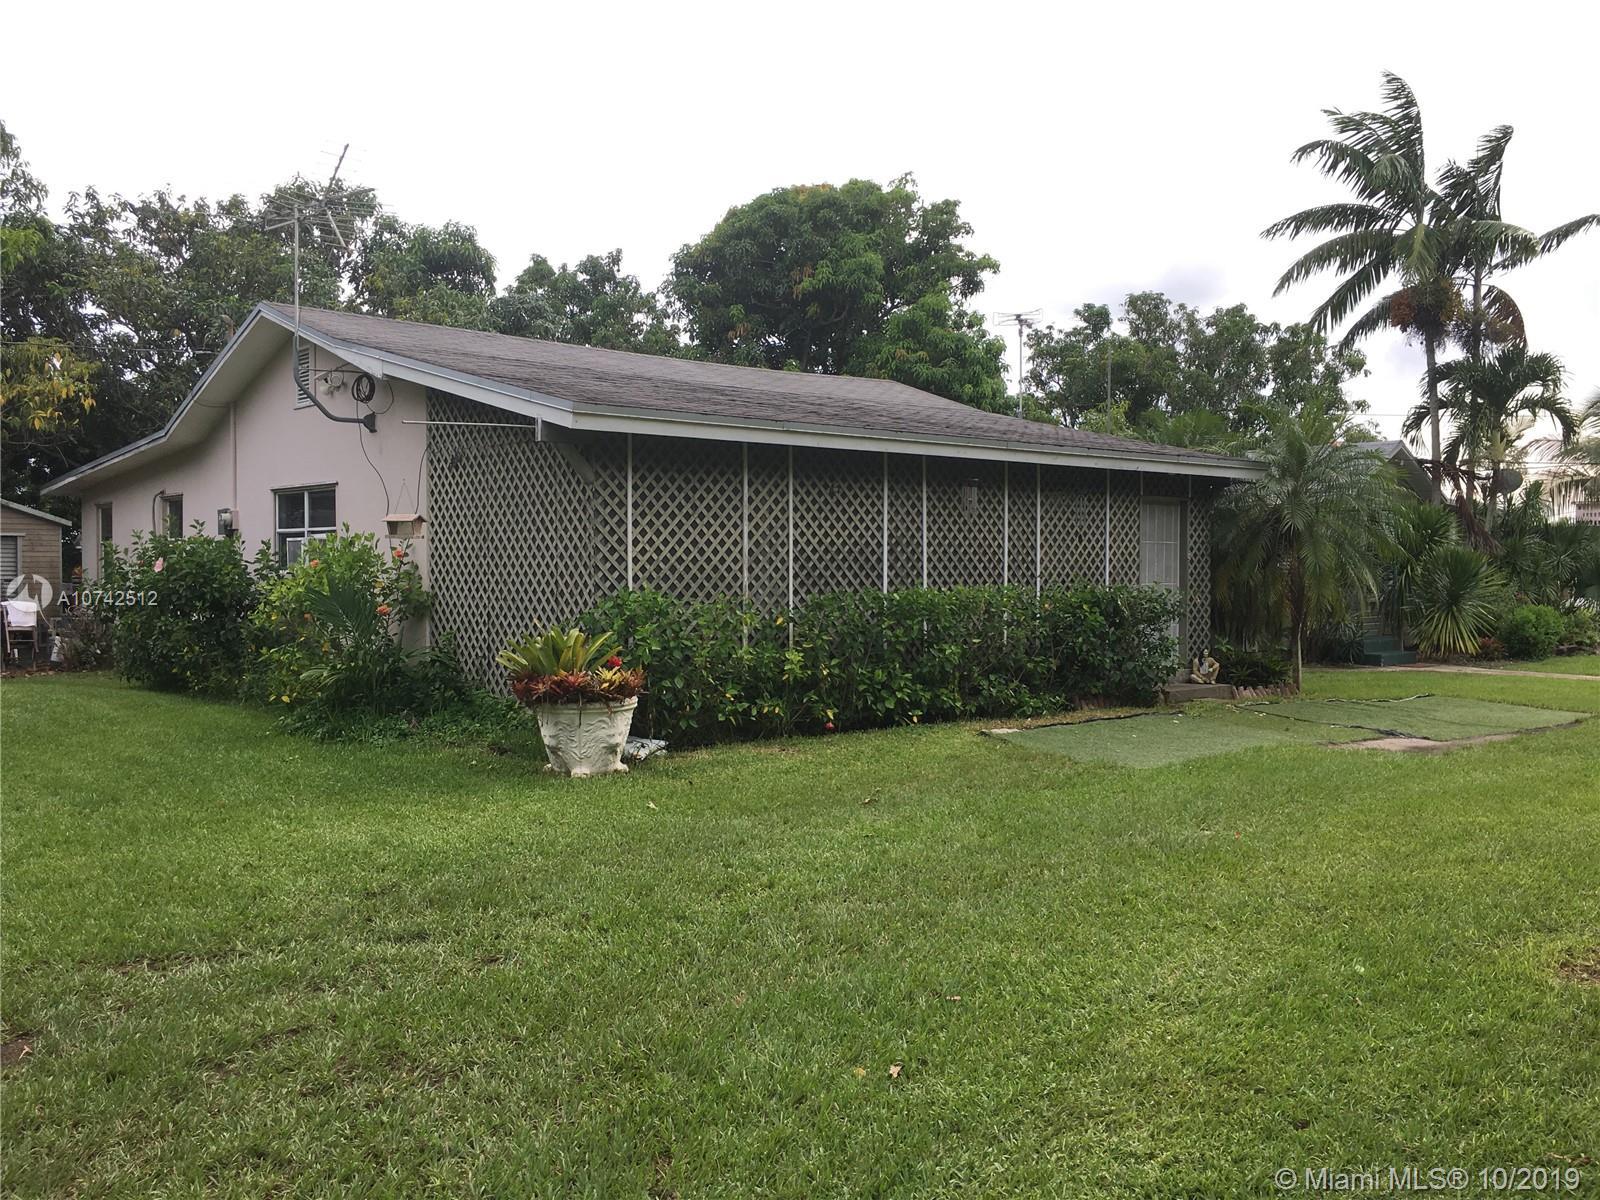 19900 SW 264th ST, Homestead, Florida